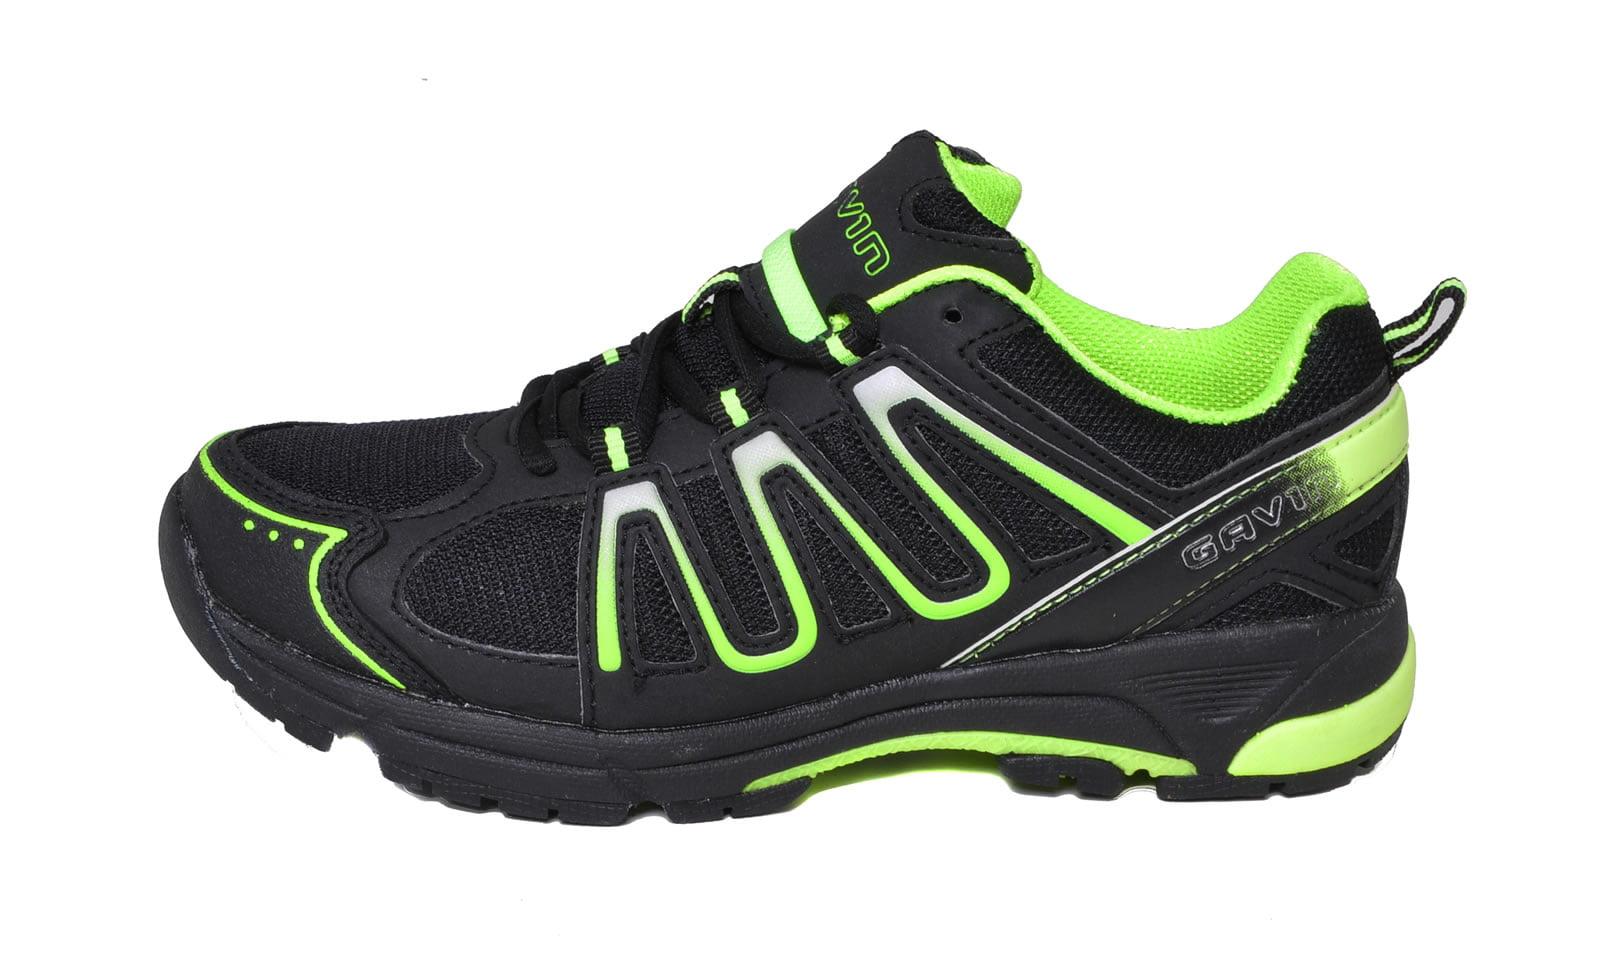 Gavin Mountain MTB Sneaker Style Cycling Shoe